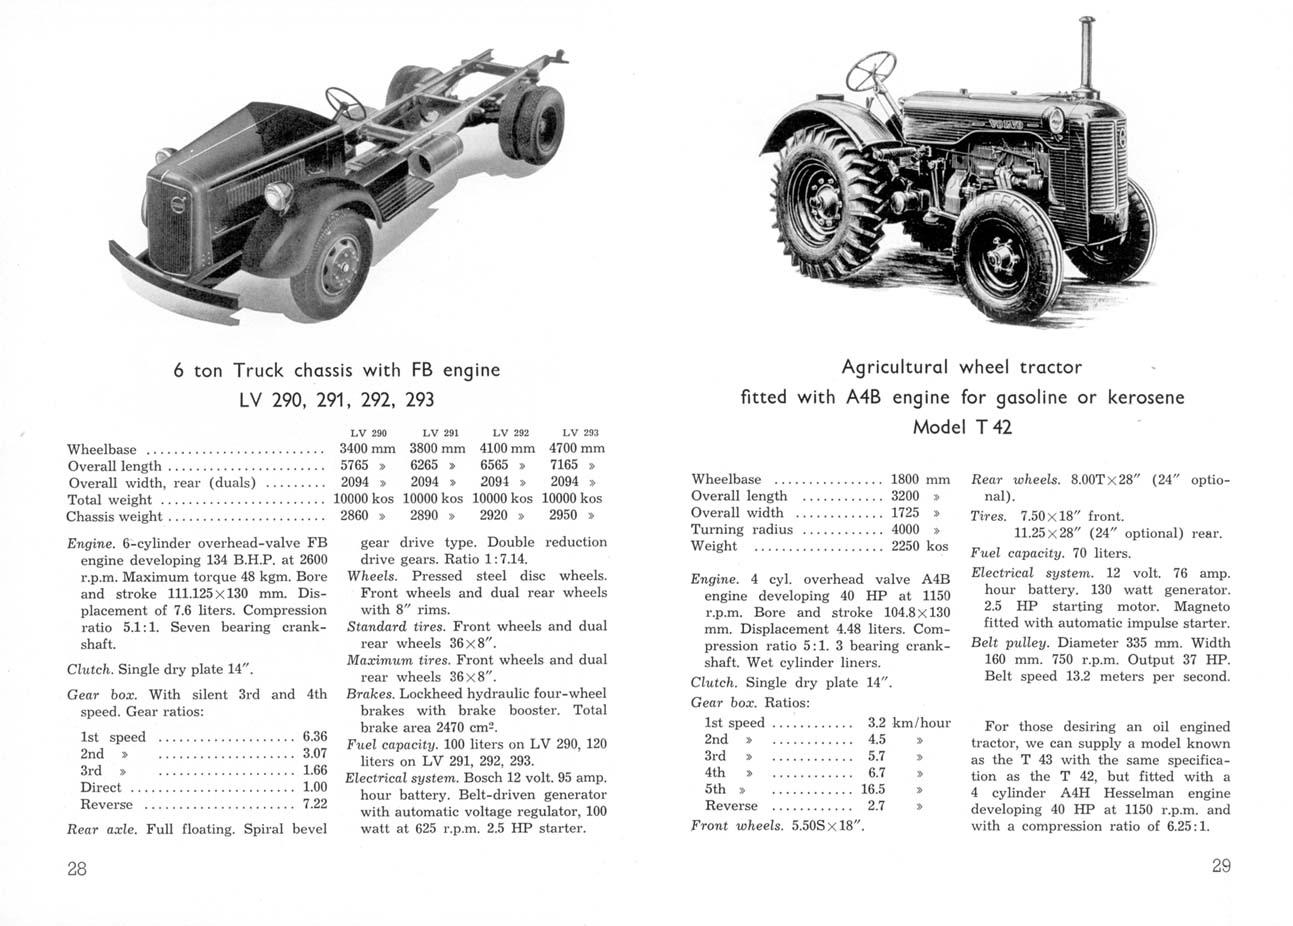 1945 Volvo Review brochure